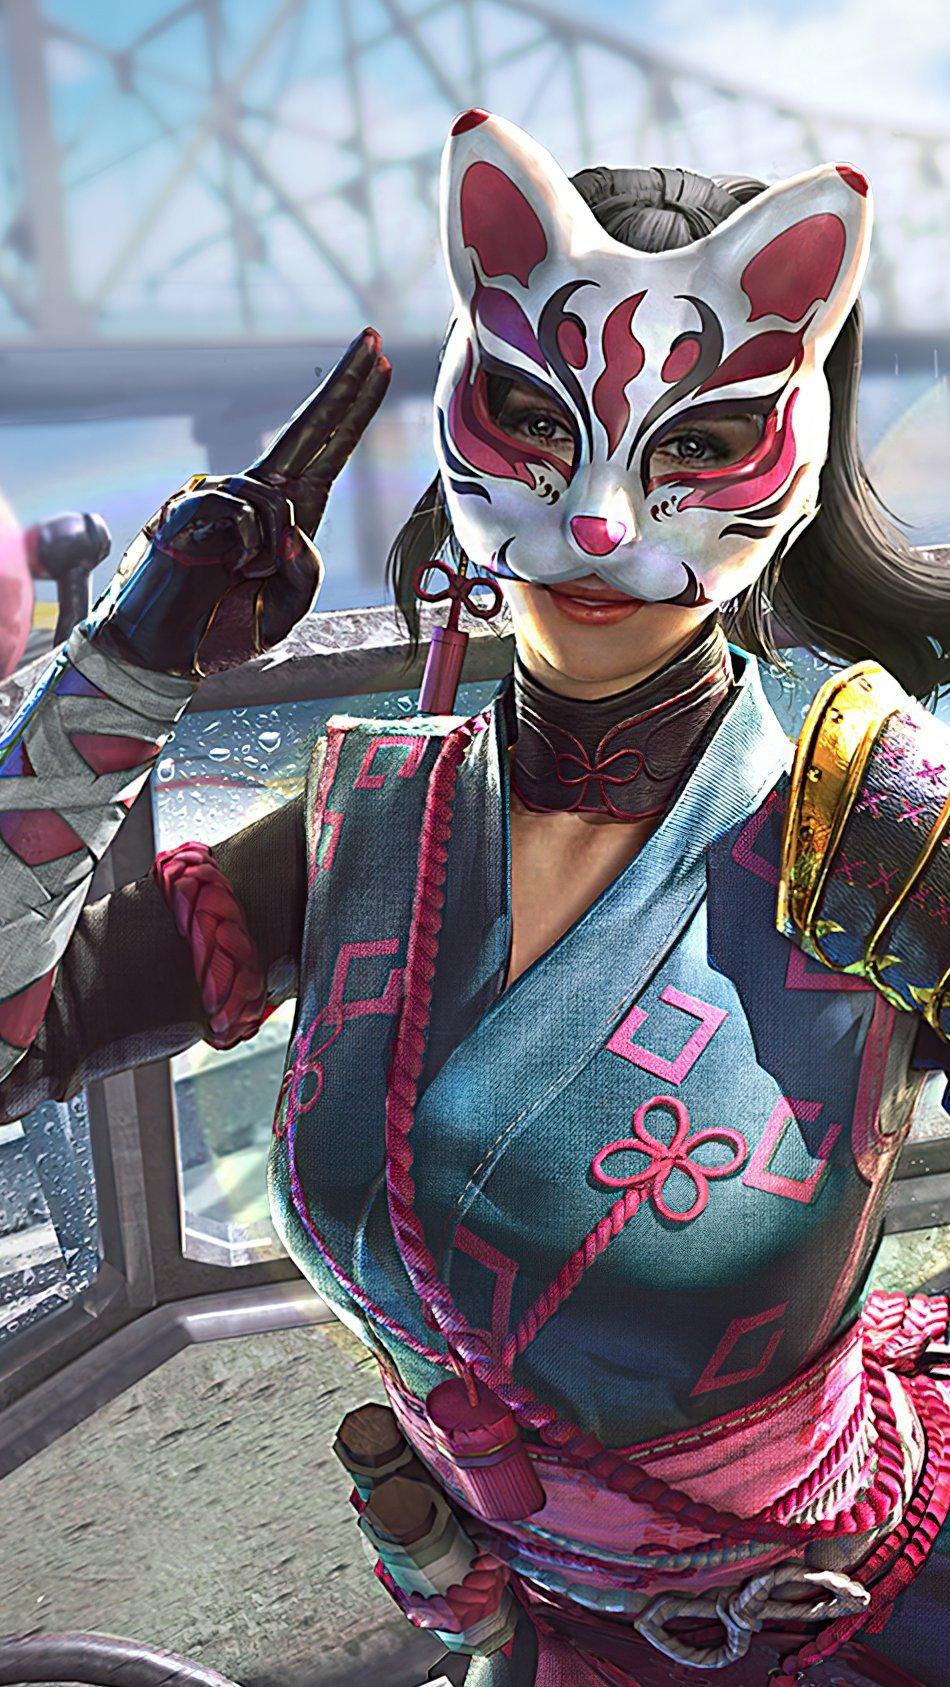 Fondos de pantalla Chica Ninja PUBG Vertical